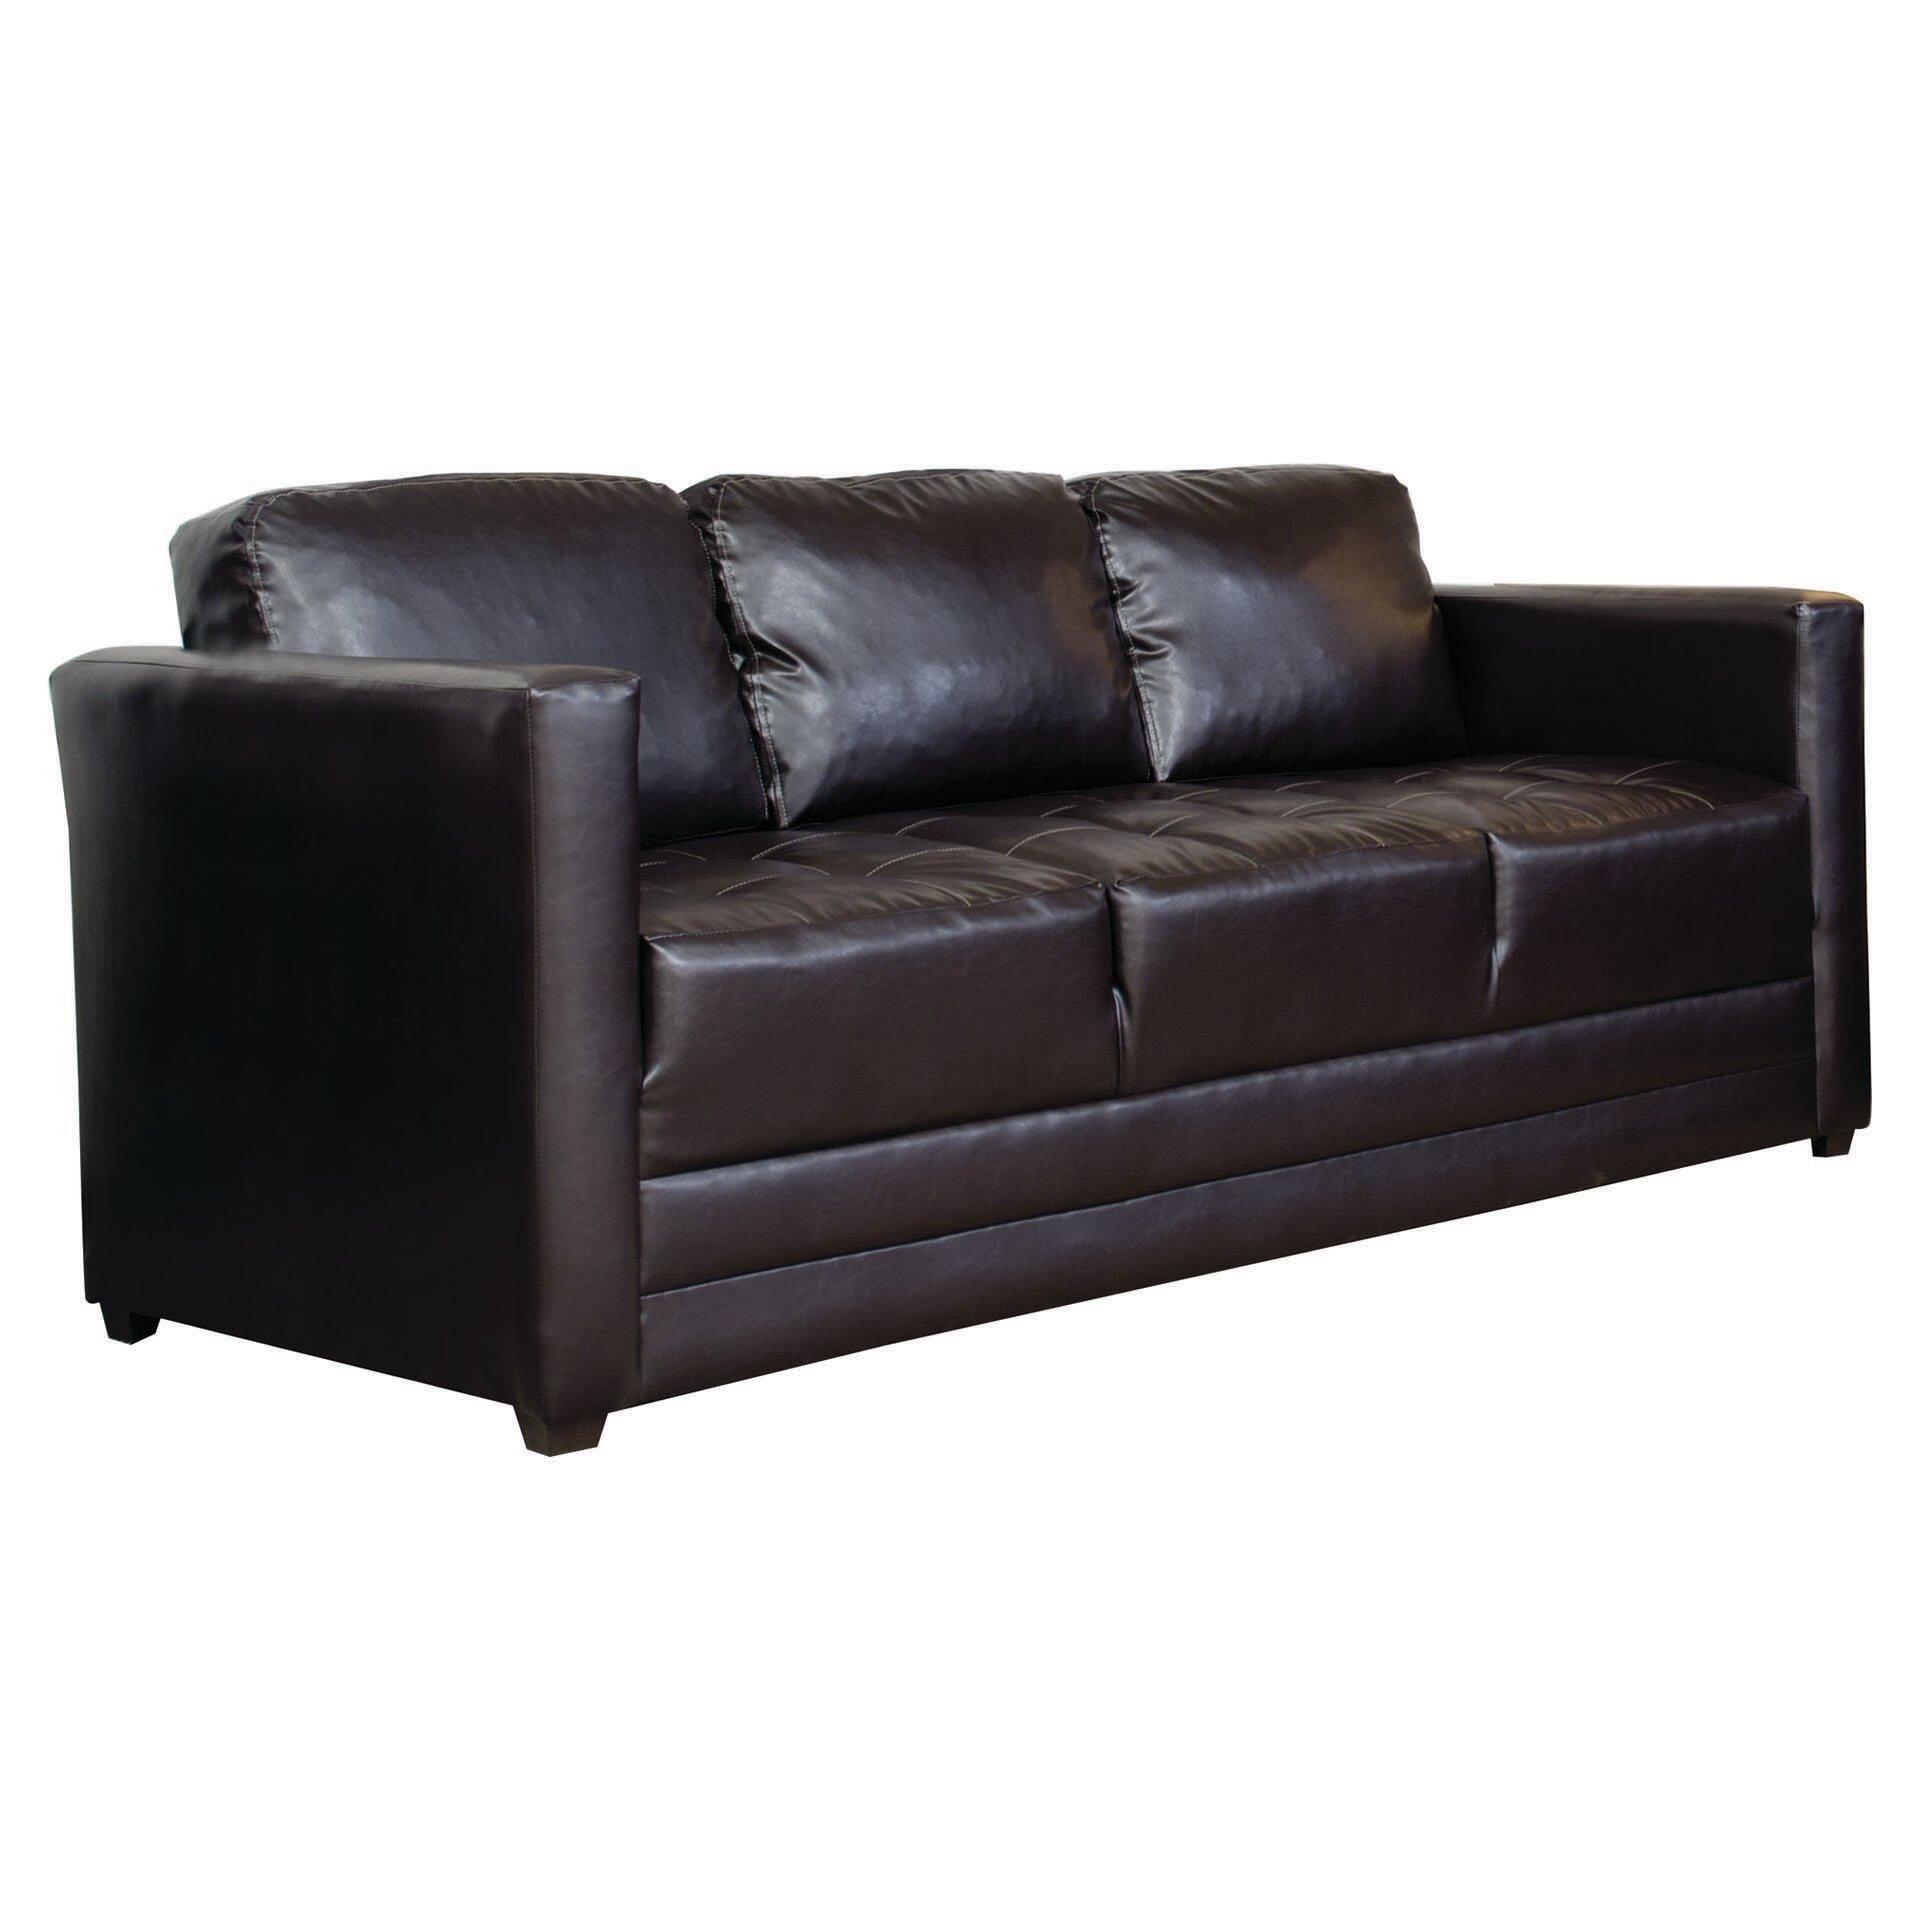 Lovesac Sofa For Sale: Trent Austin Design Serta Upholstery Winchendon Sofa